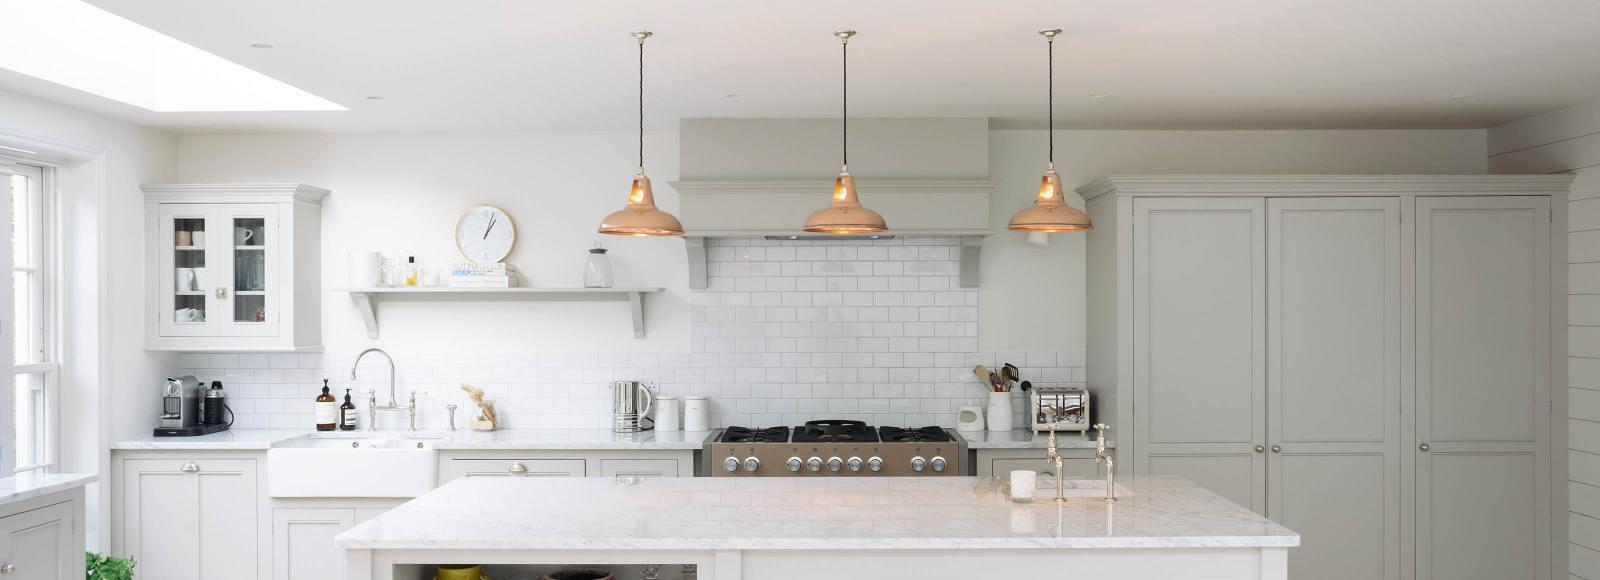 Gentil Bespoke Kitchens, Bathrooms And Interiors By DeVOL